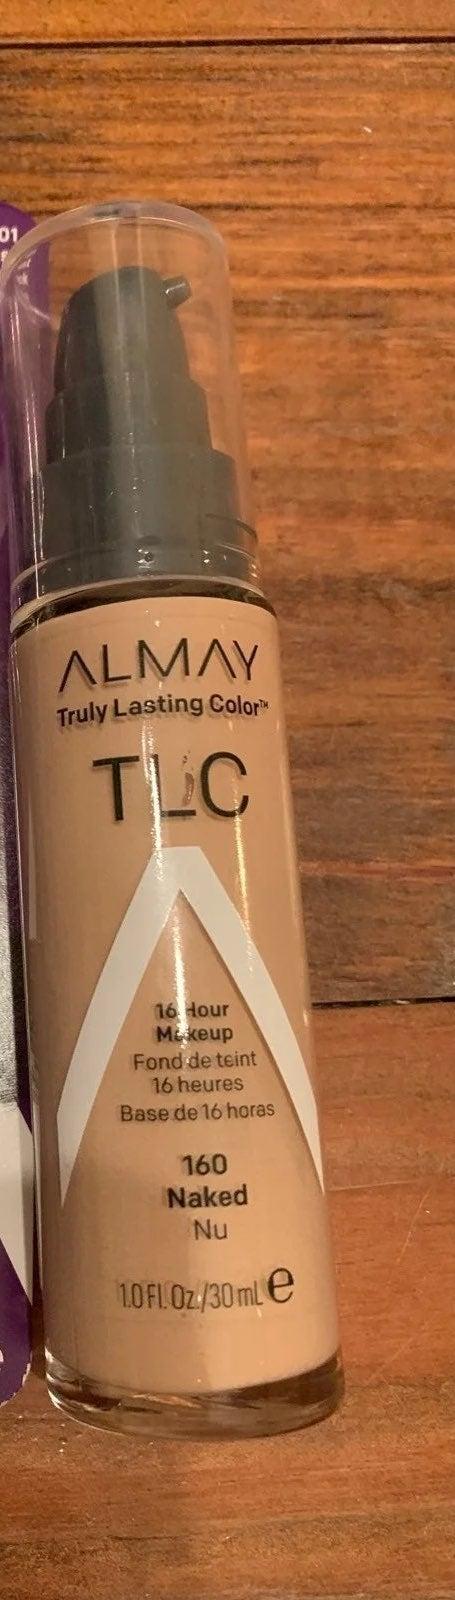 Almay mascara and foundation+free gift